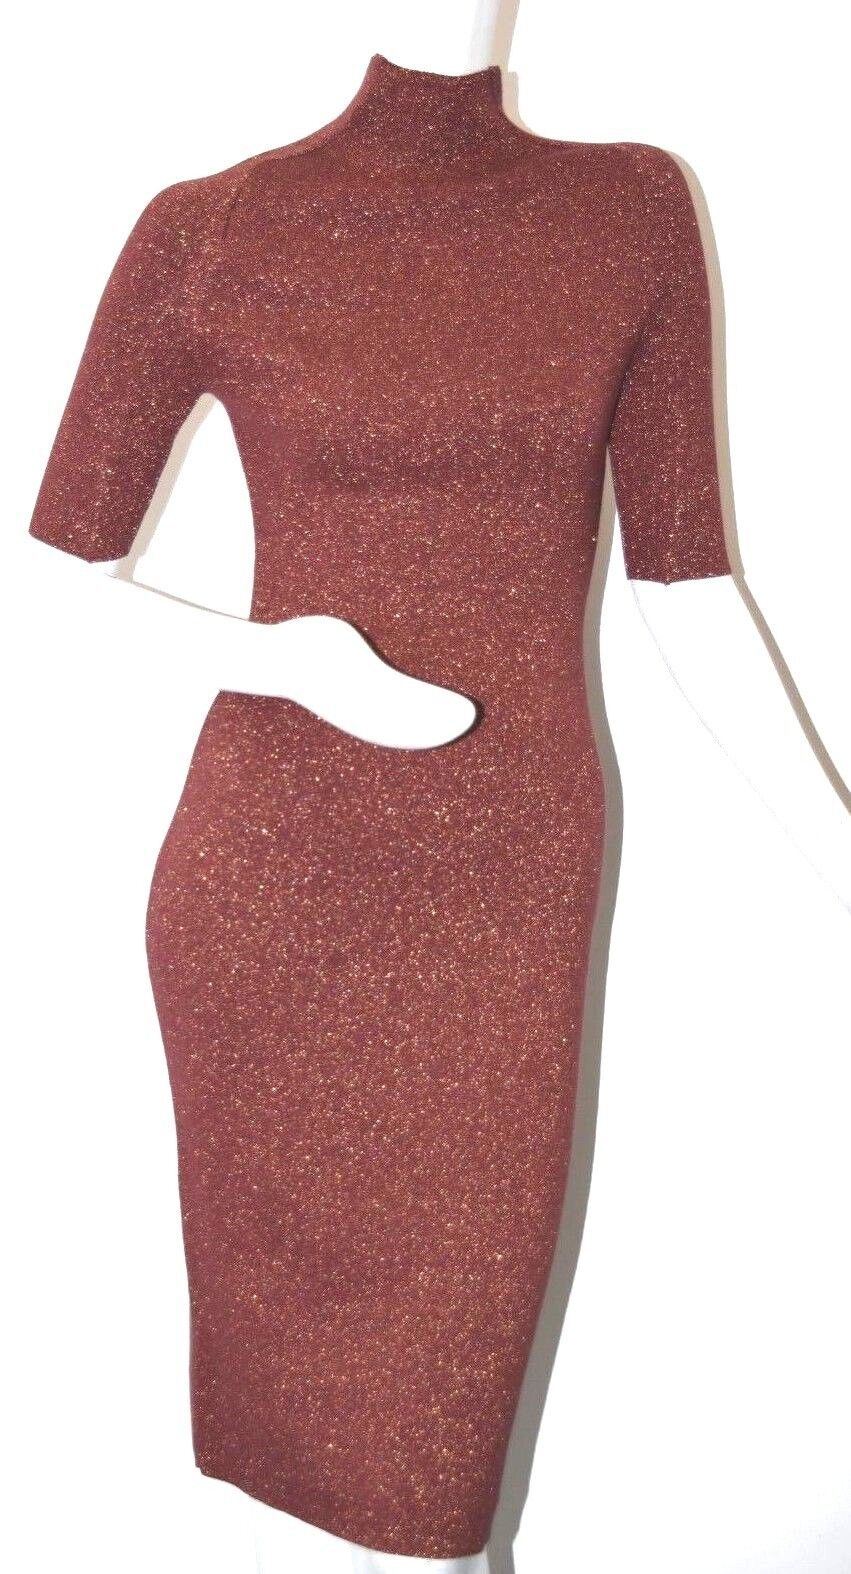 NEW LELA pink Knit Dress Red Burgundy Wine gold Metallic Lurex XS S